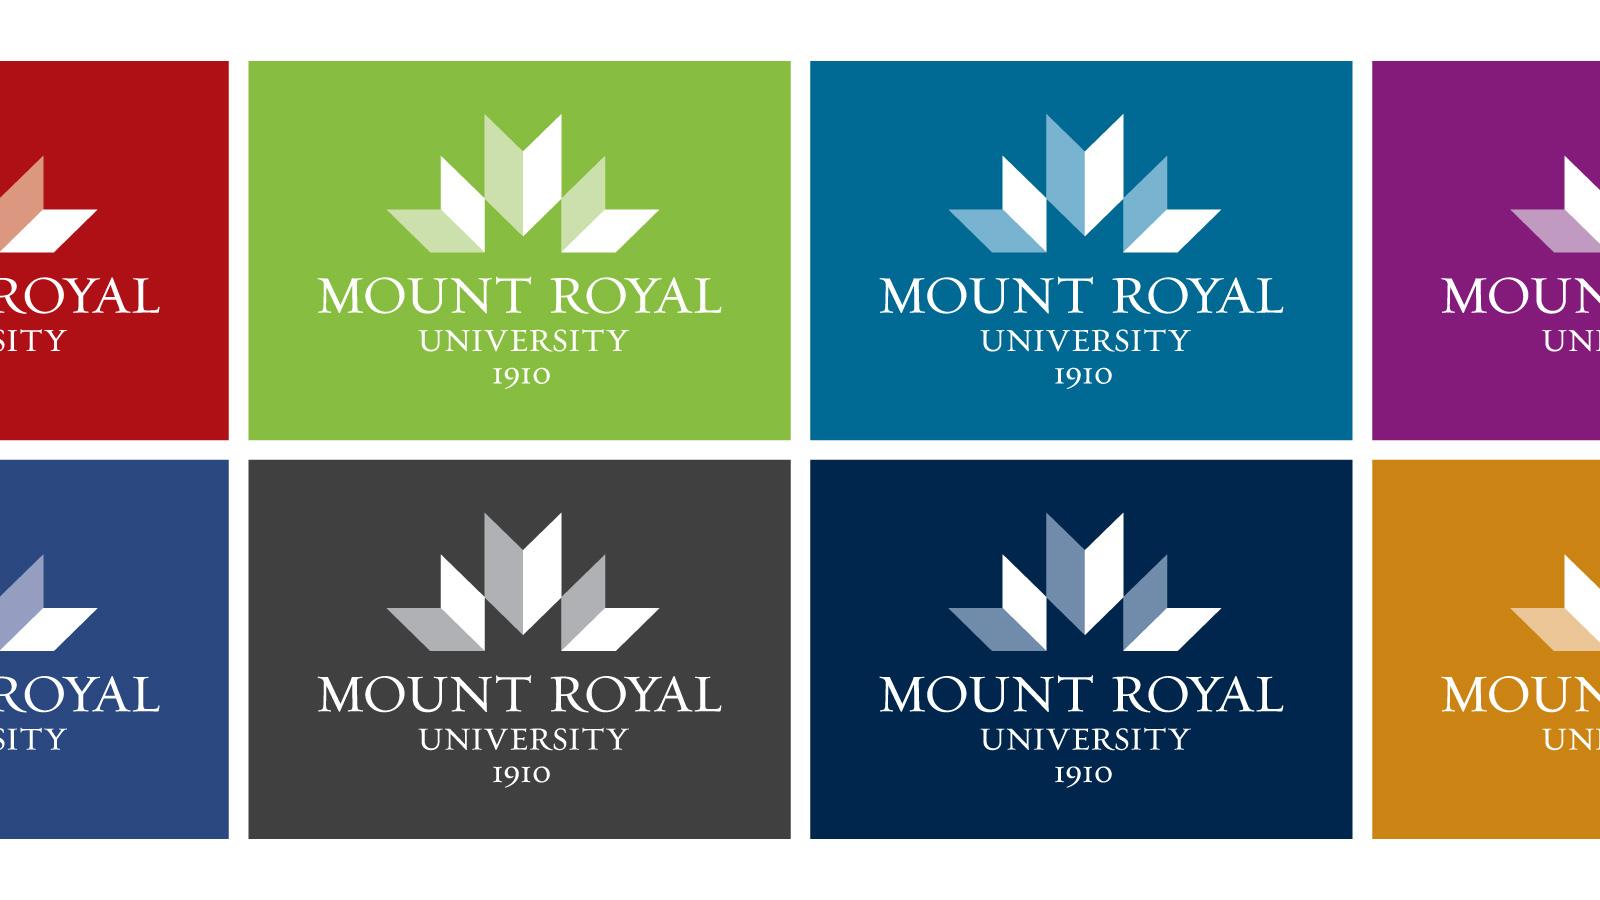 Mount Royal University | Campagne de marque |